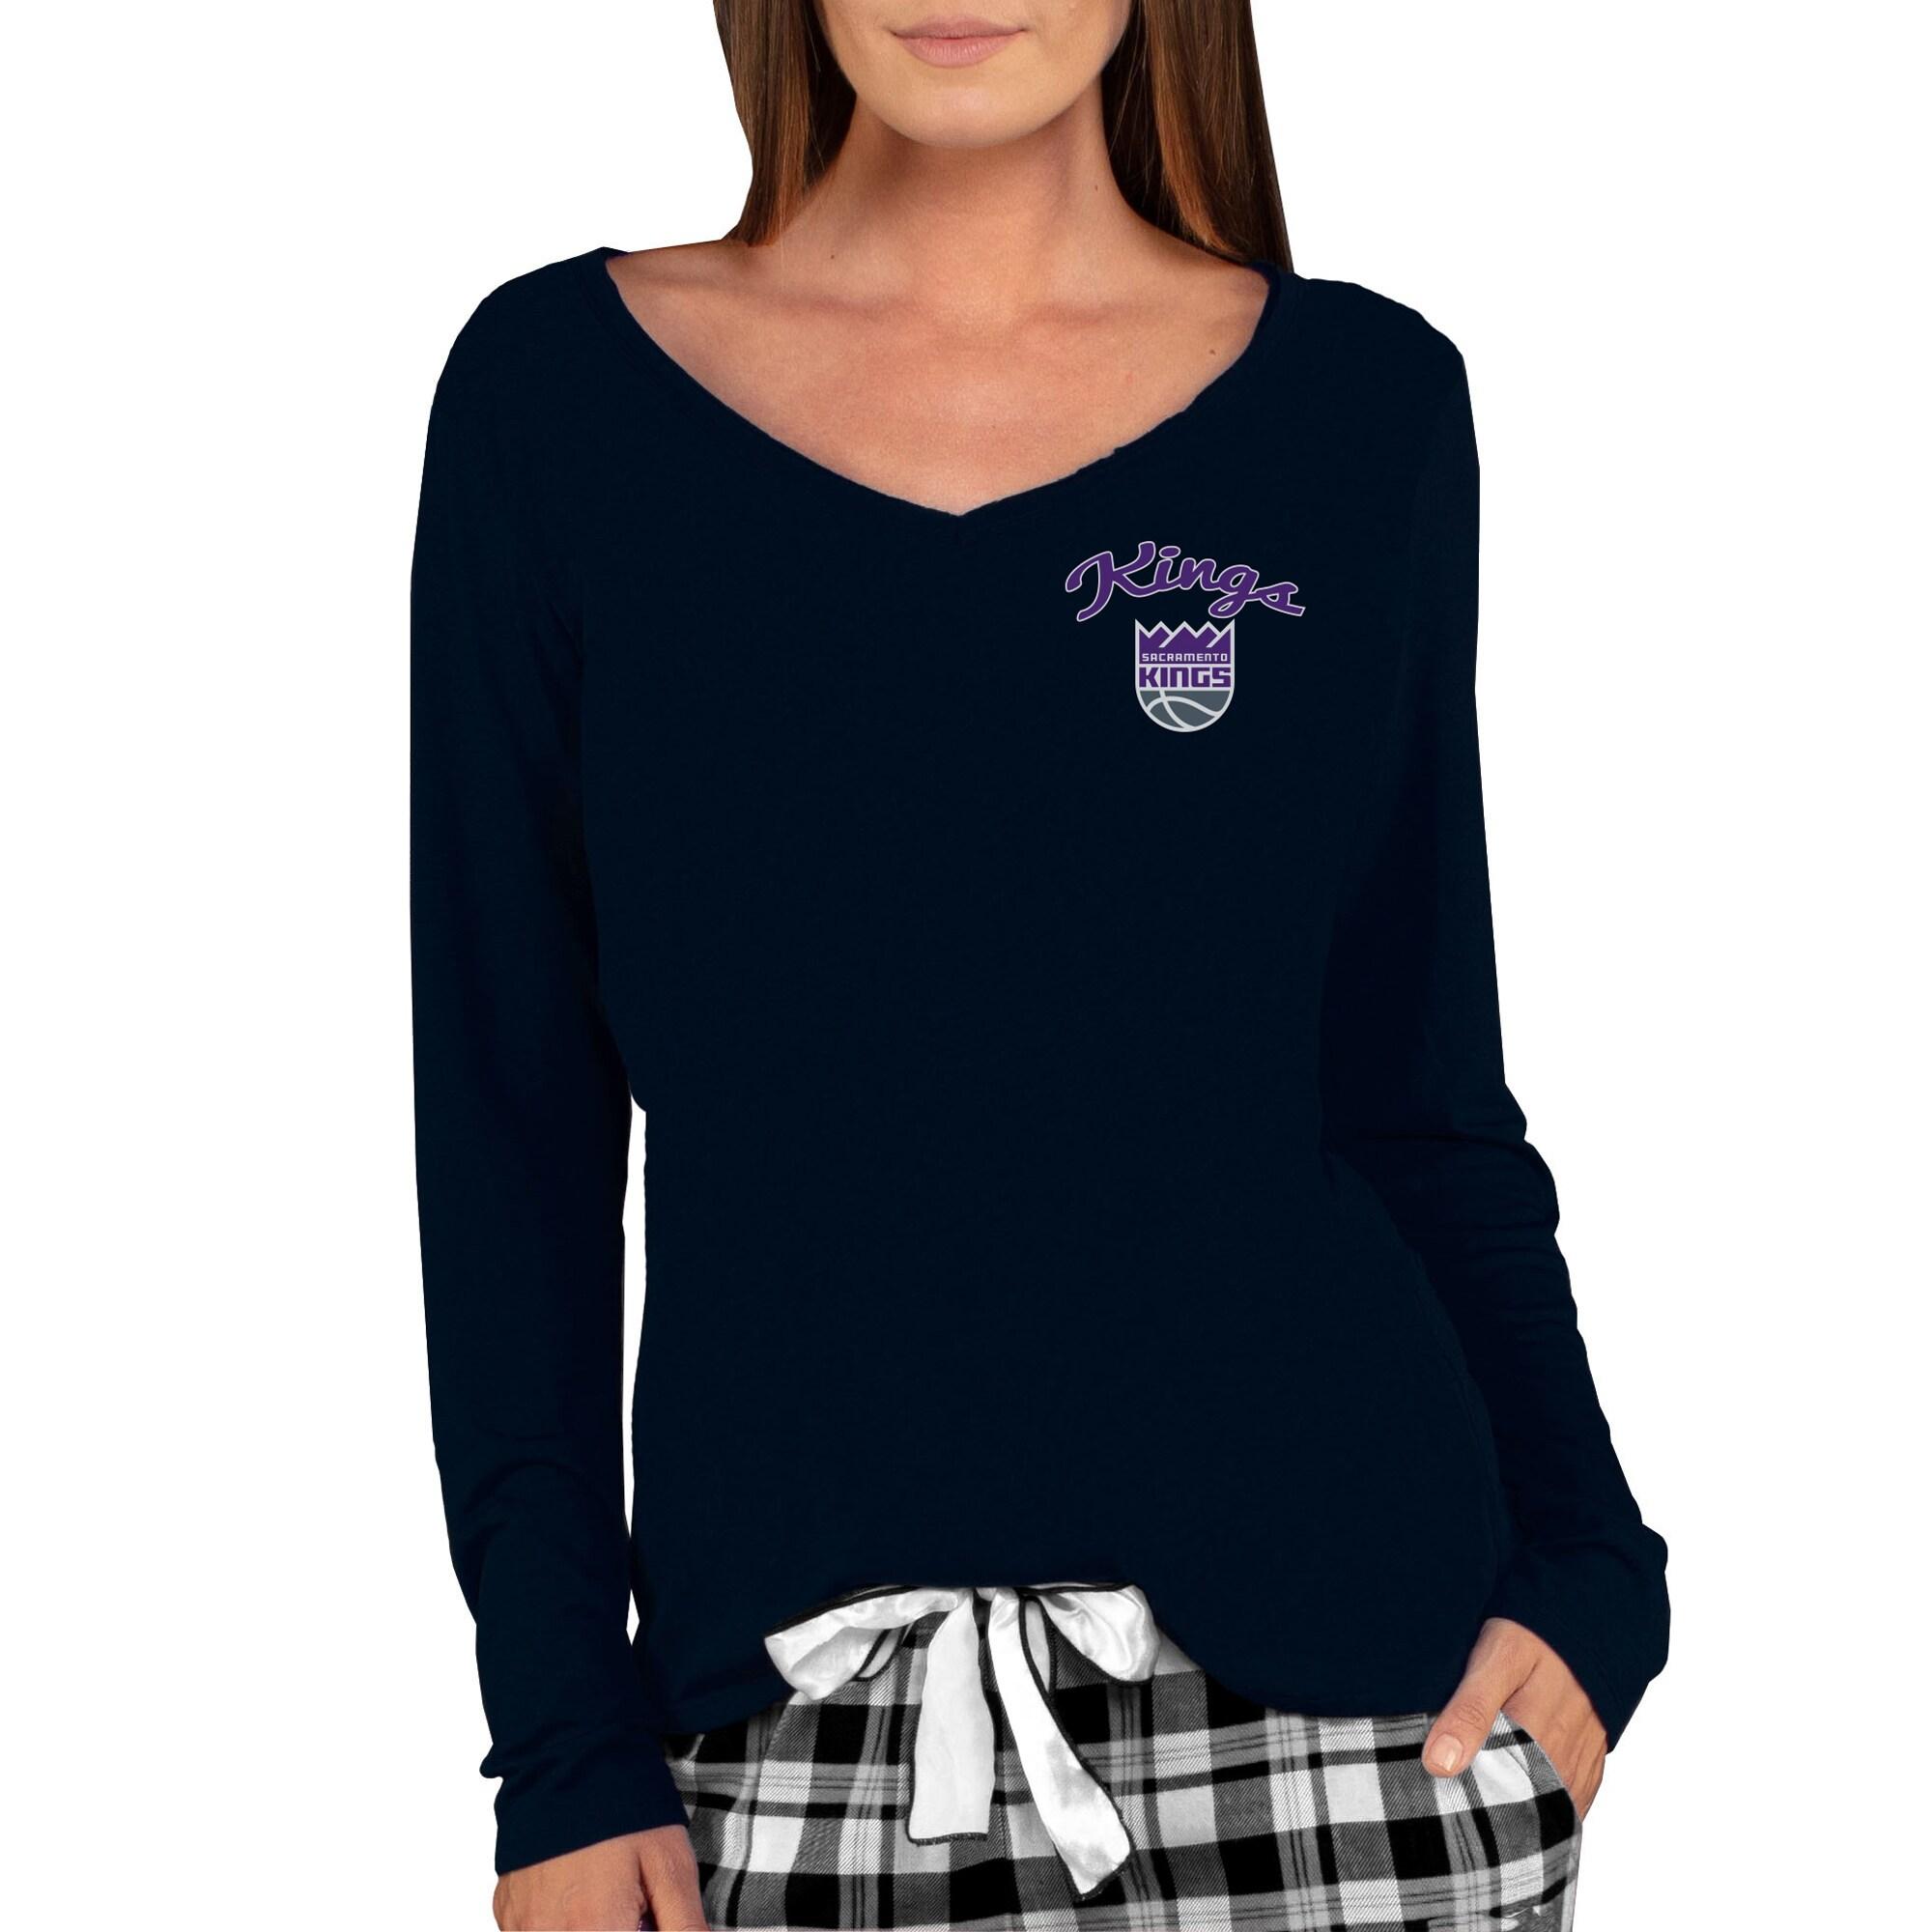 Sacramento Kings Concepts Sport Women's Marathon V-Neck Long Sleeve T-Shirt - Black